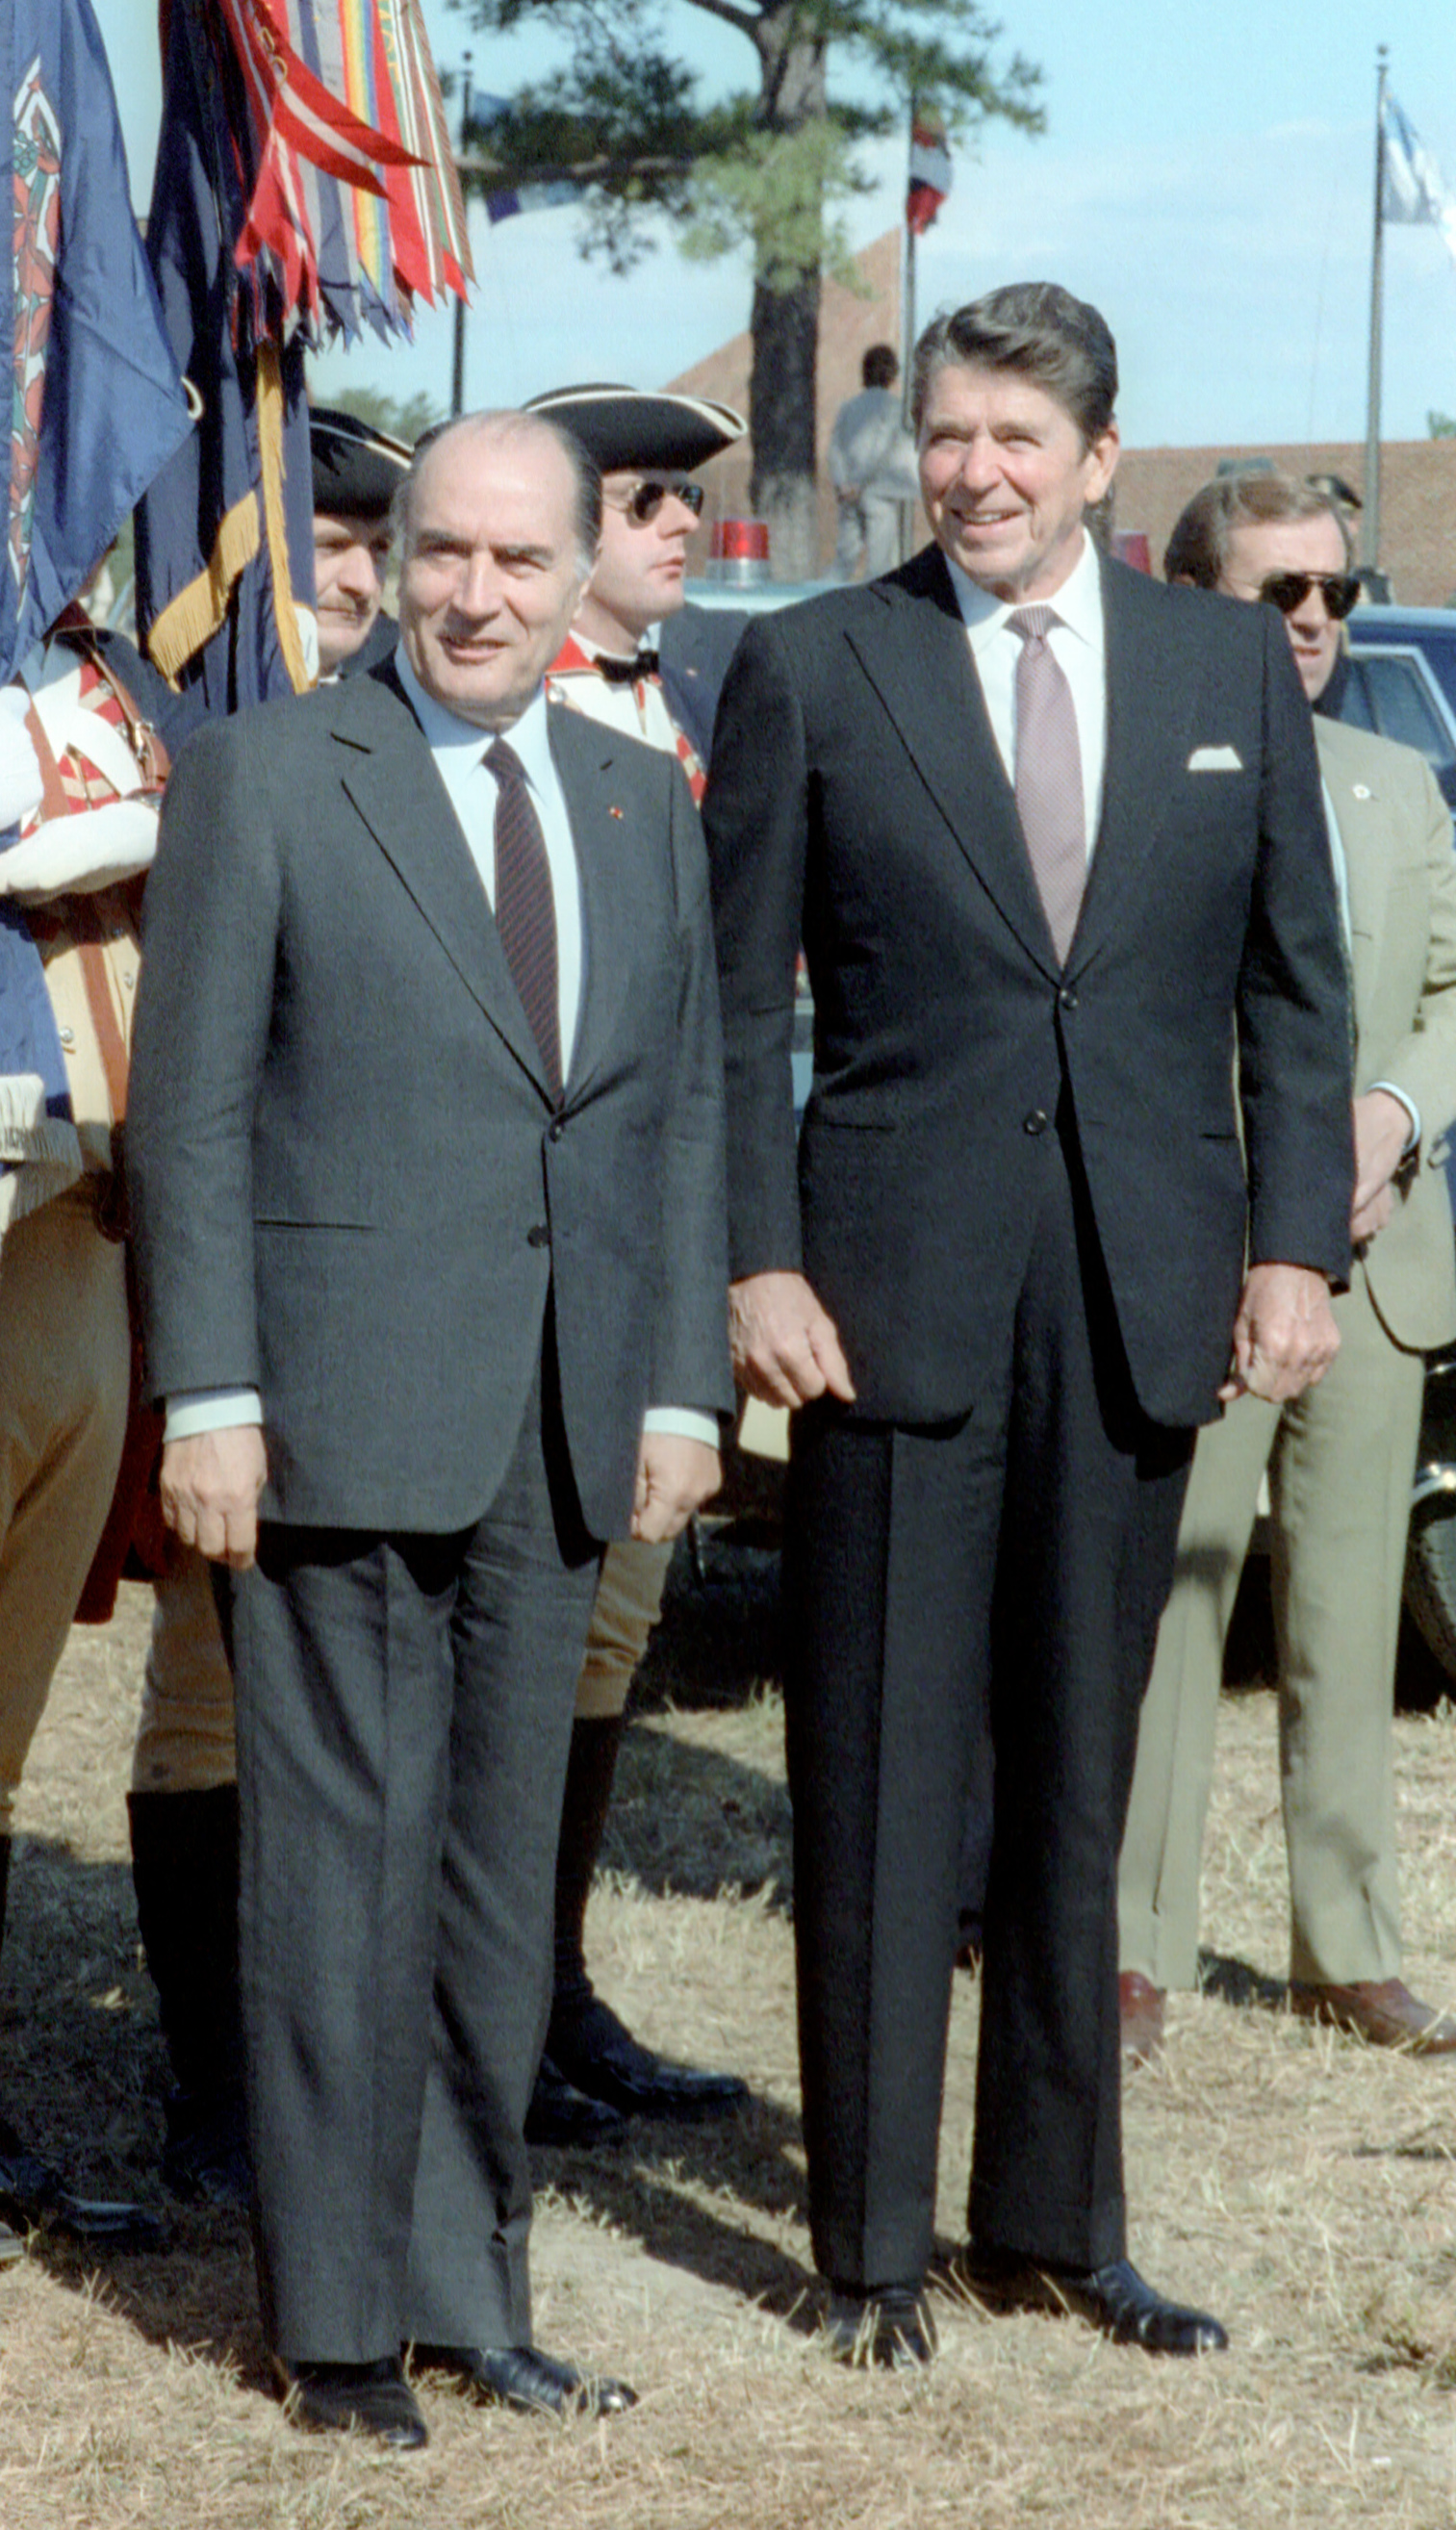 File:Reagan Mitterrand 1981.jpg